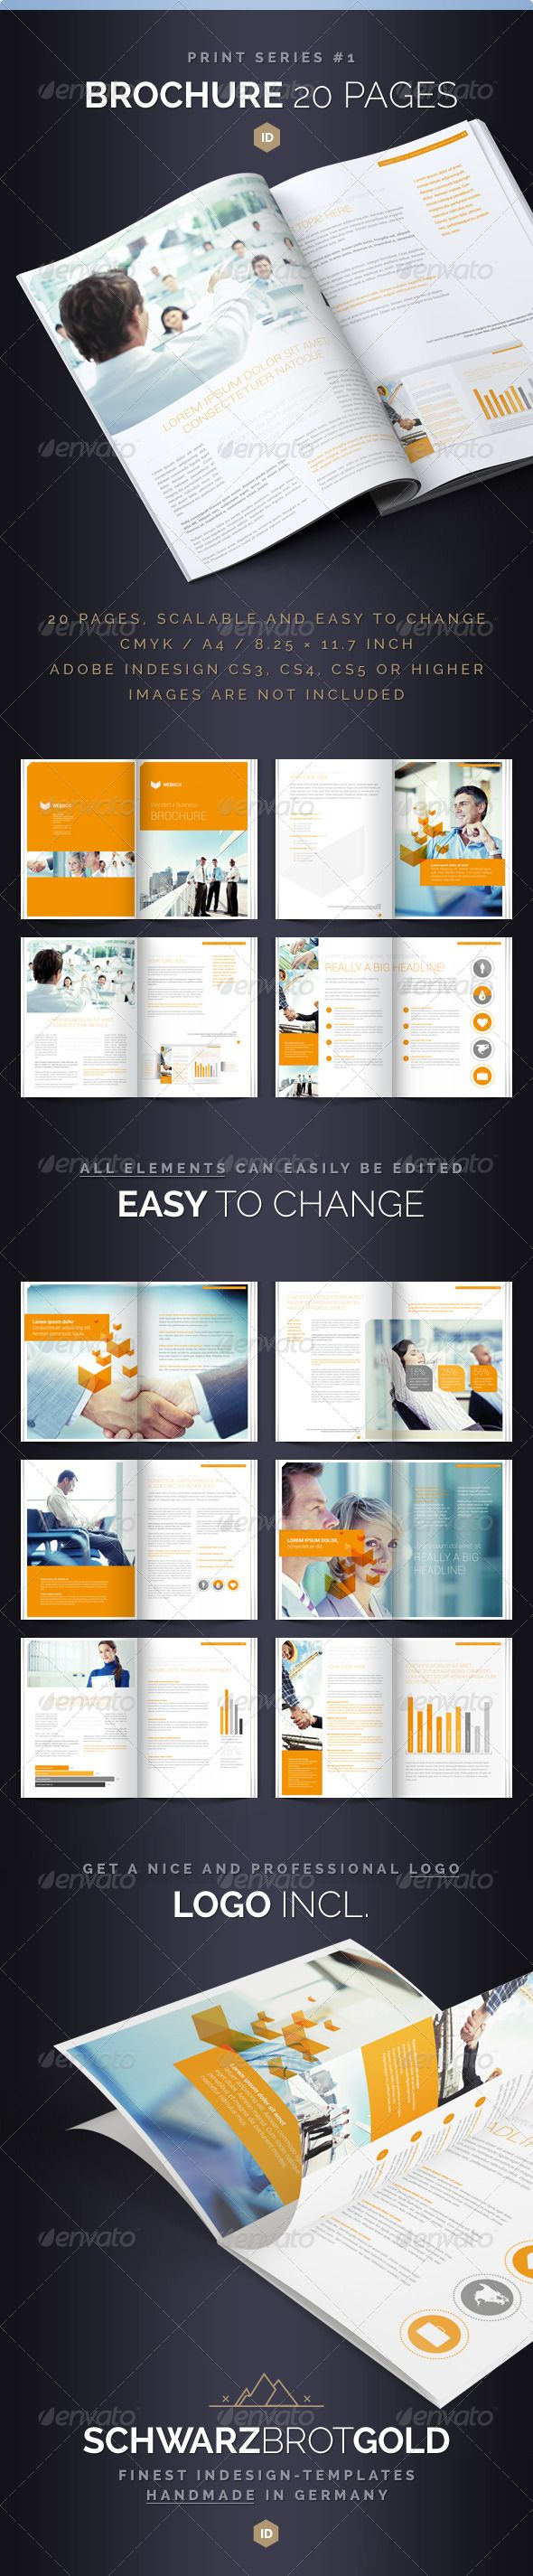 Brochure 20 Pages Series 1 - Corporate Brochures